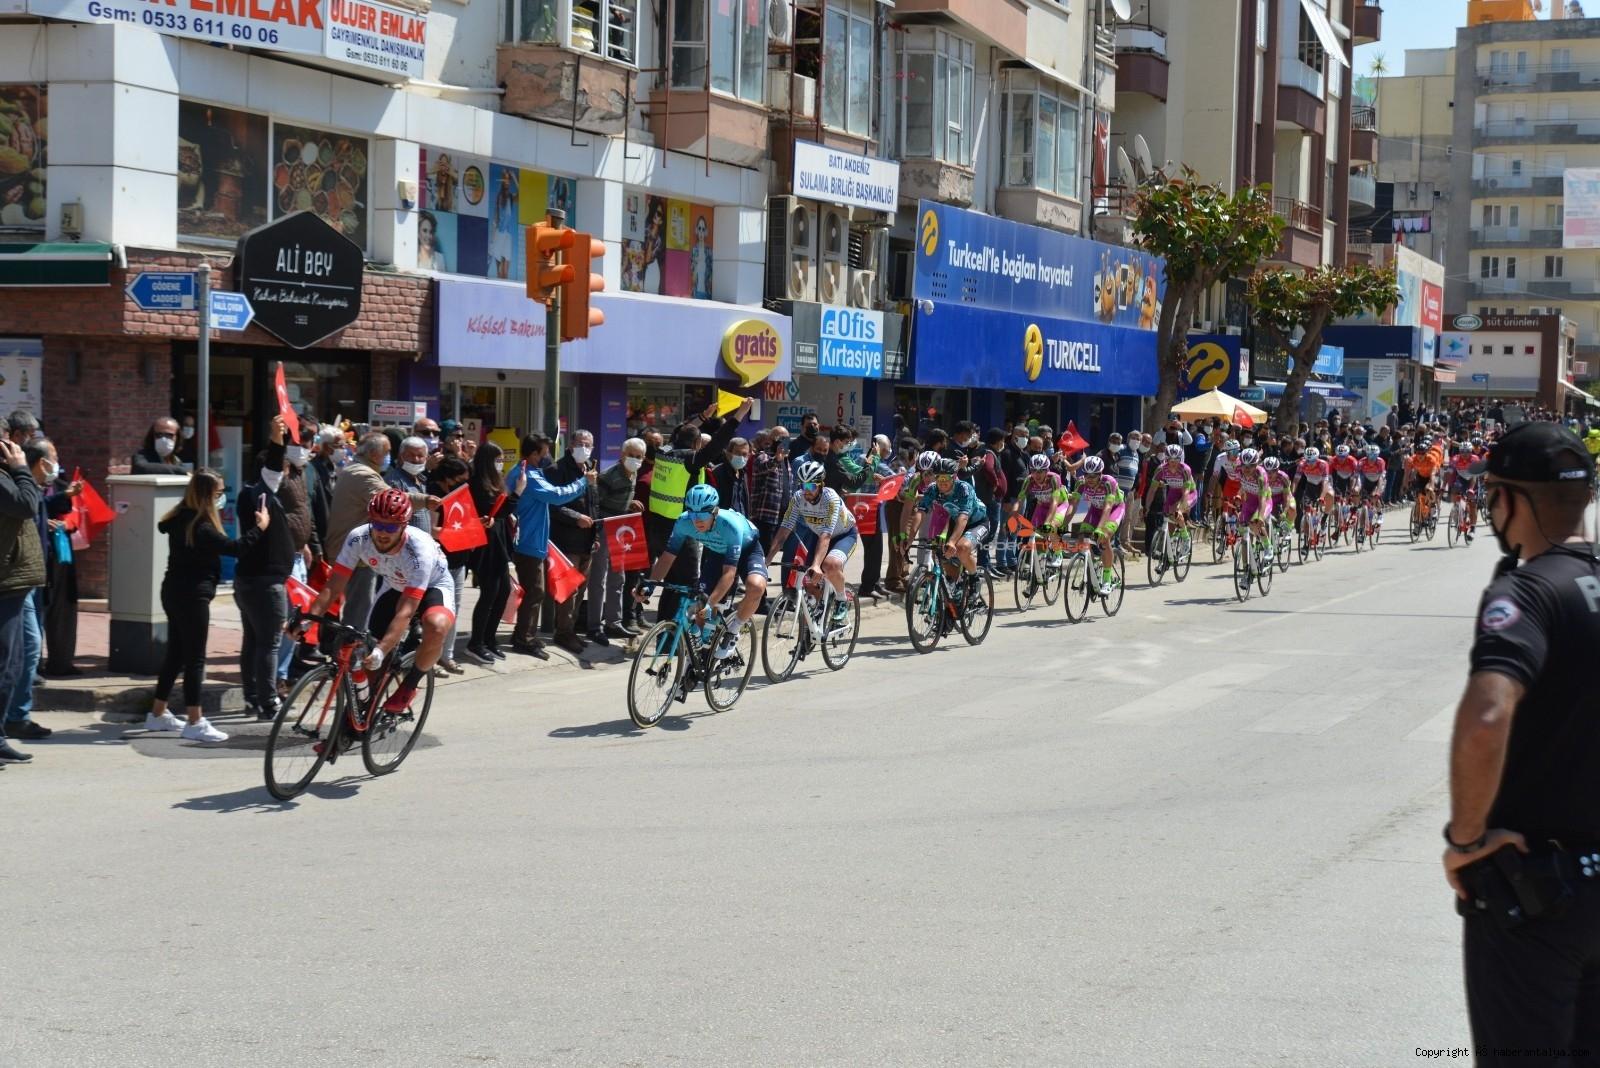 2021/04/56-cumhurbaskanligi-turkiye-bisiklet-turunda-kaza-ucuz-atlatildi-20210415AW29-6.jpg